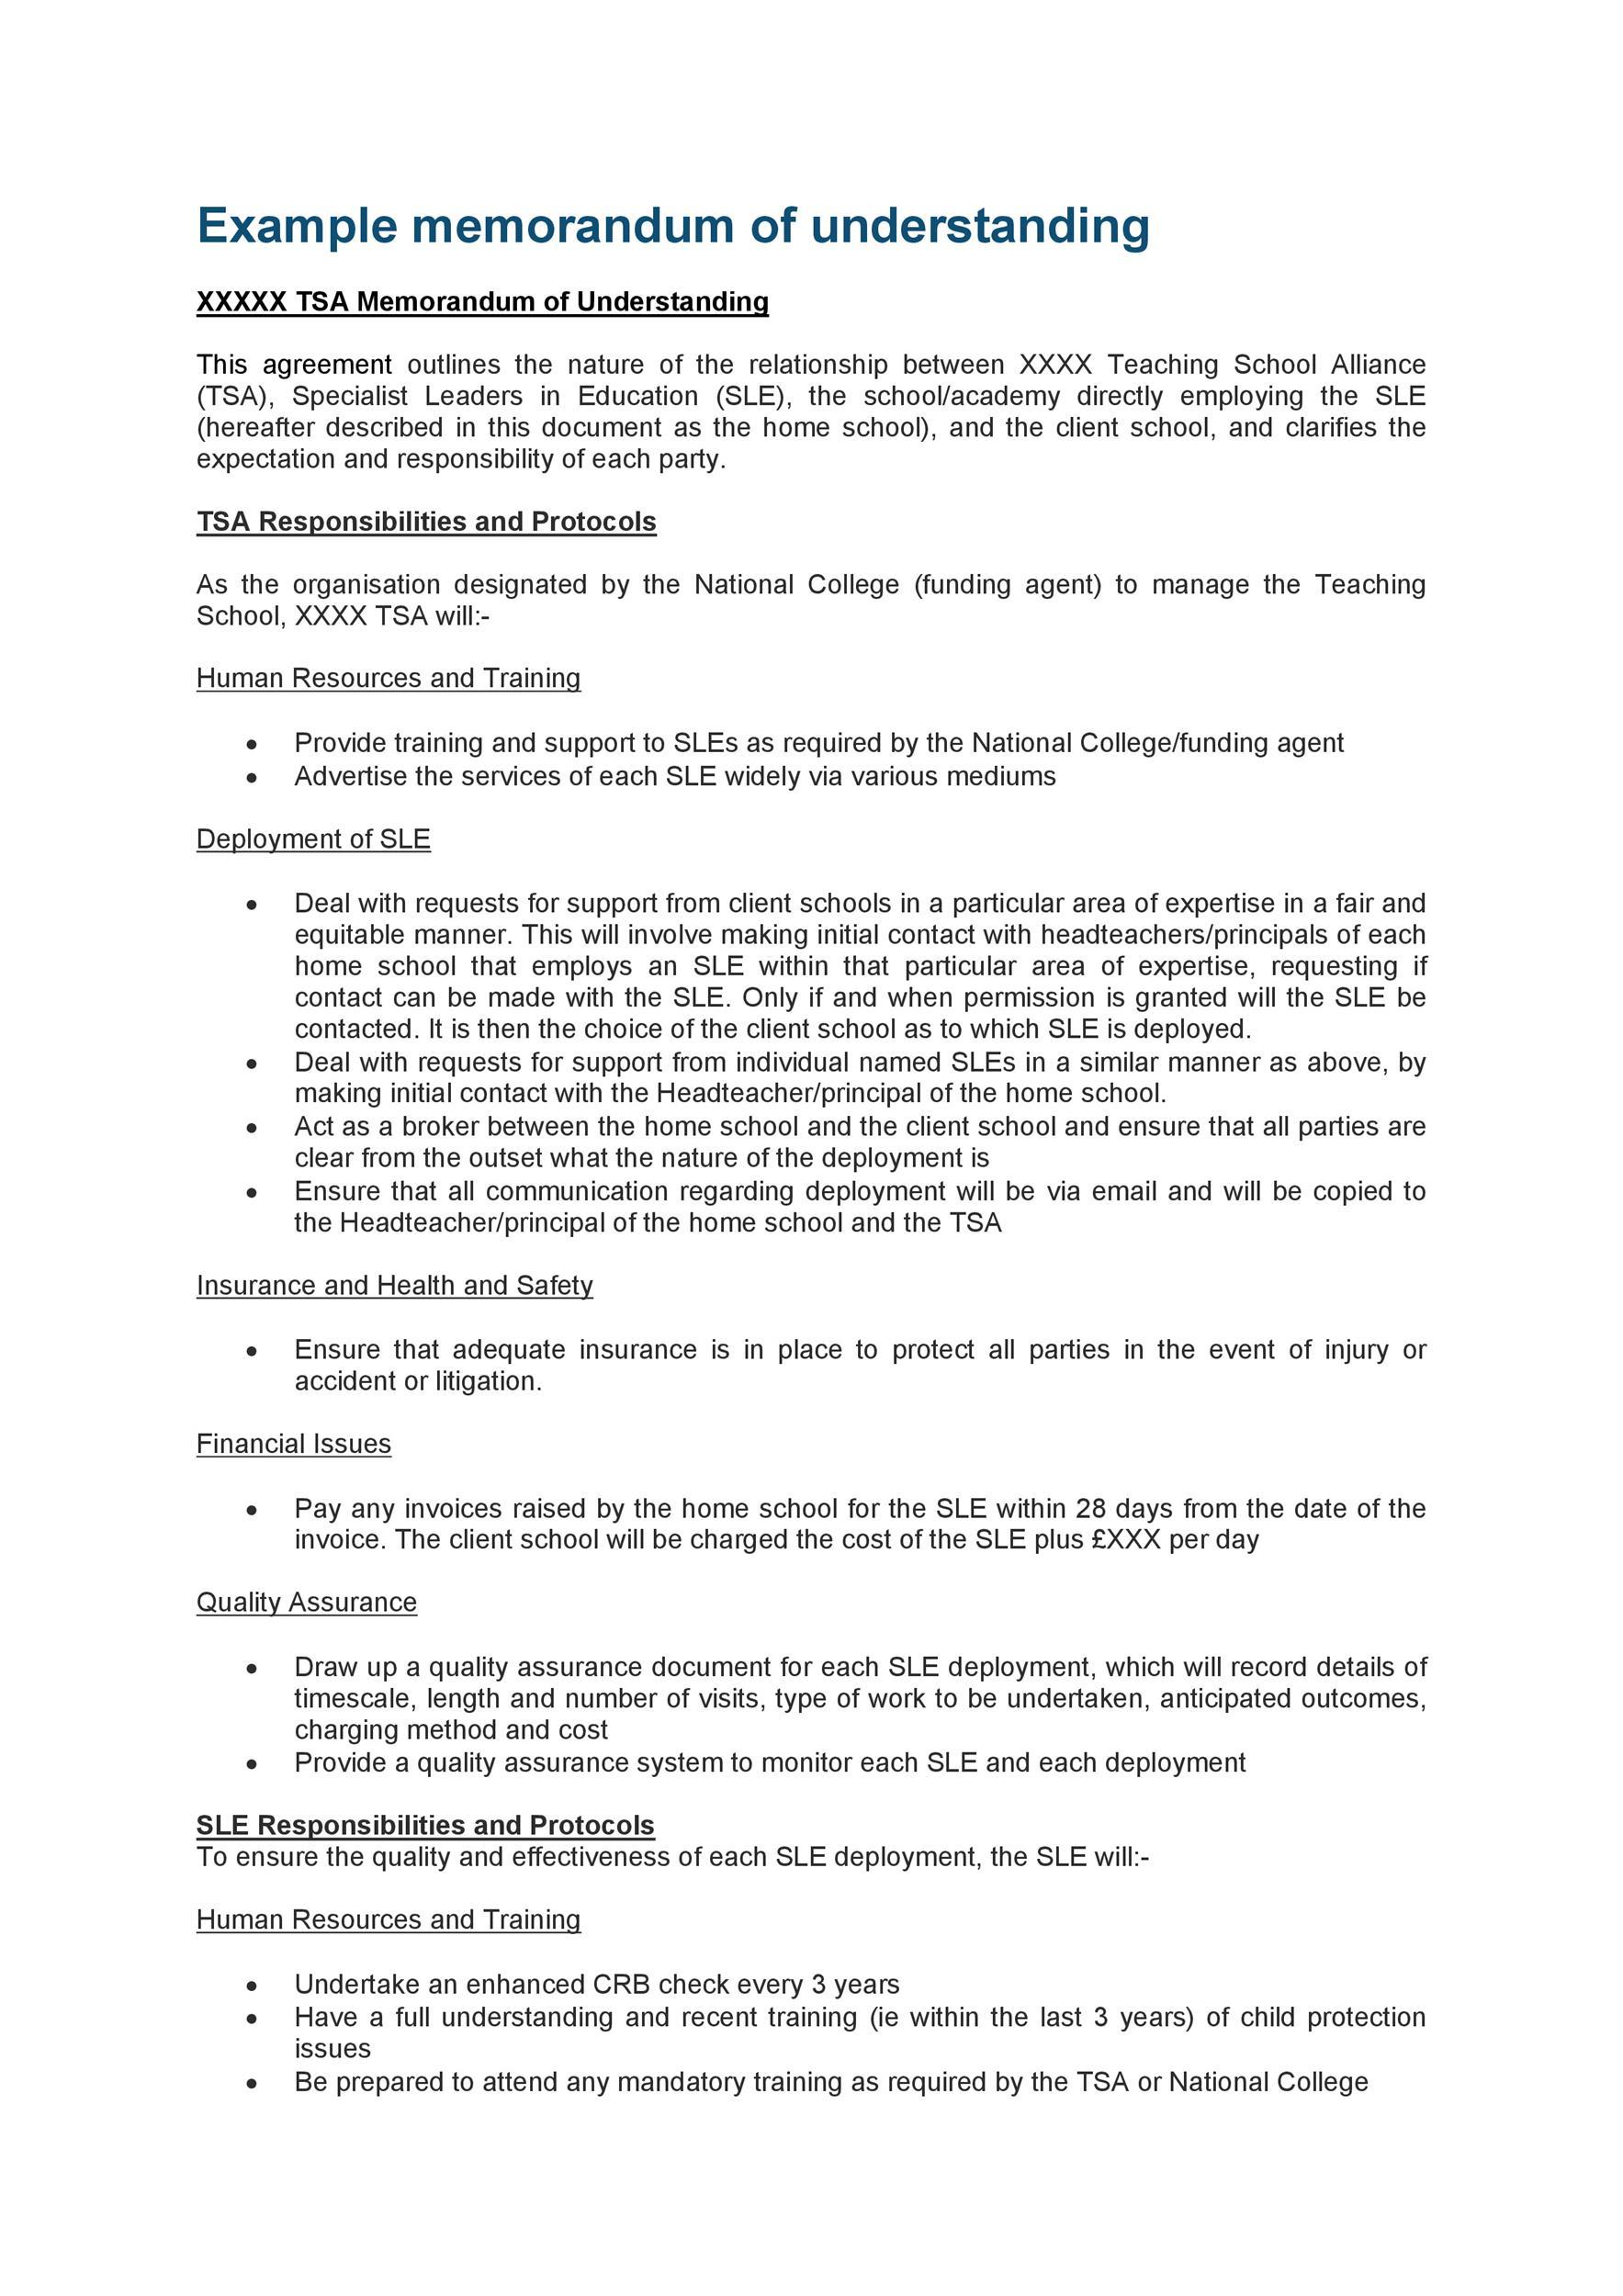 Free Memorandum of Understanding Template 24